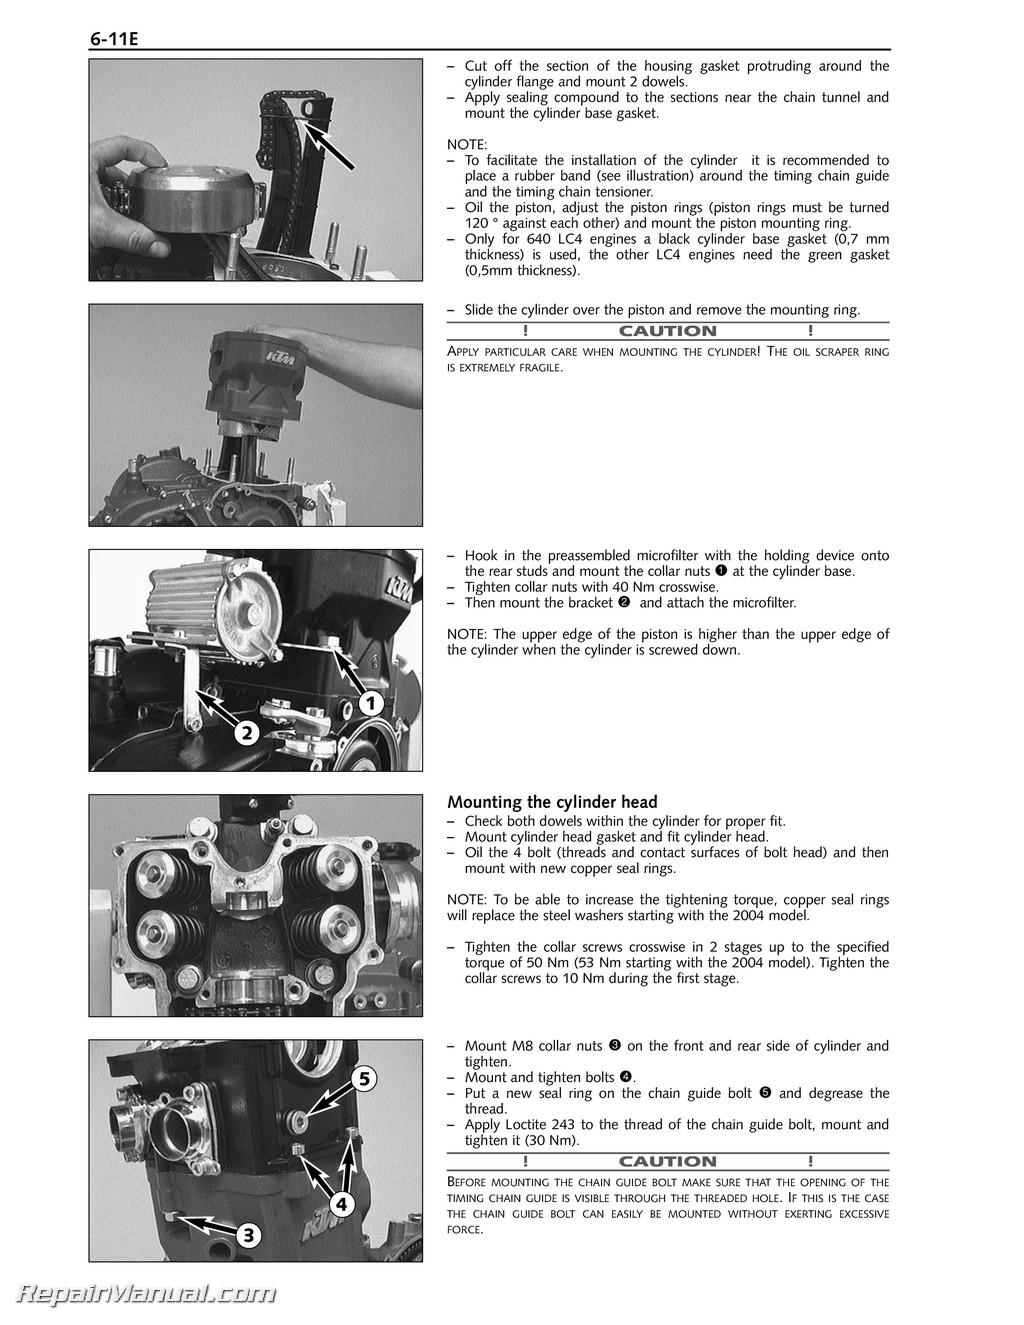 95 Honda Atv Engine Diagram Wiring Diagrams Schematics Trx70 On Clutch 1986 Trx 70 For